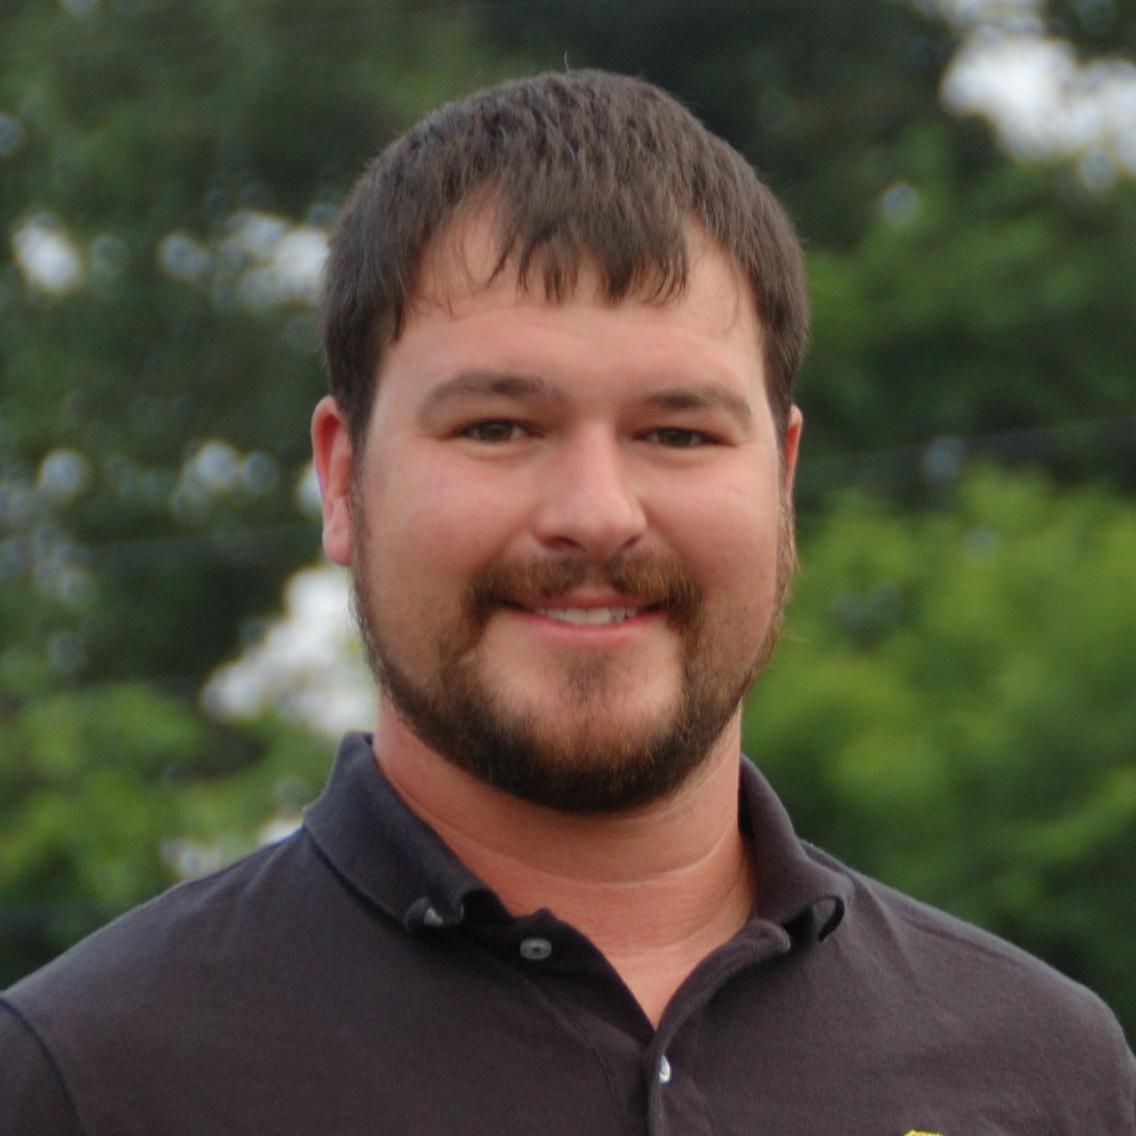 Joe Rehbergar  Field Service 4 years